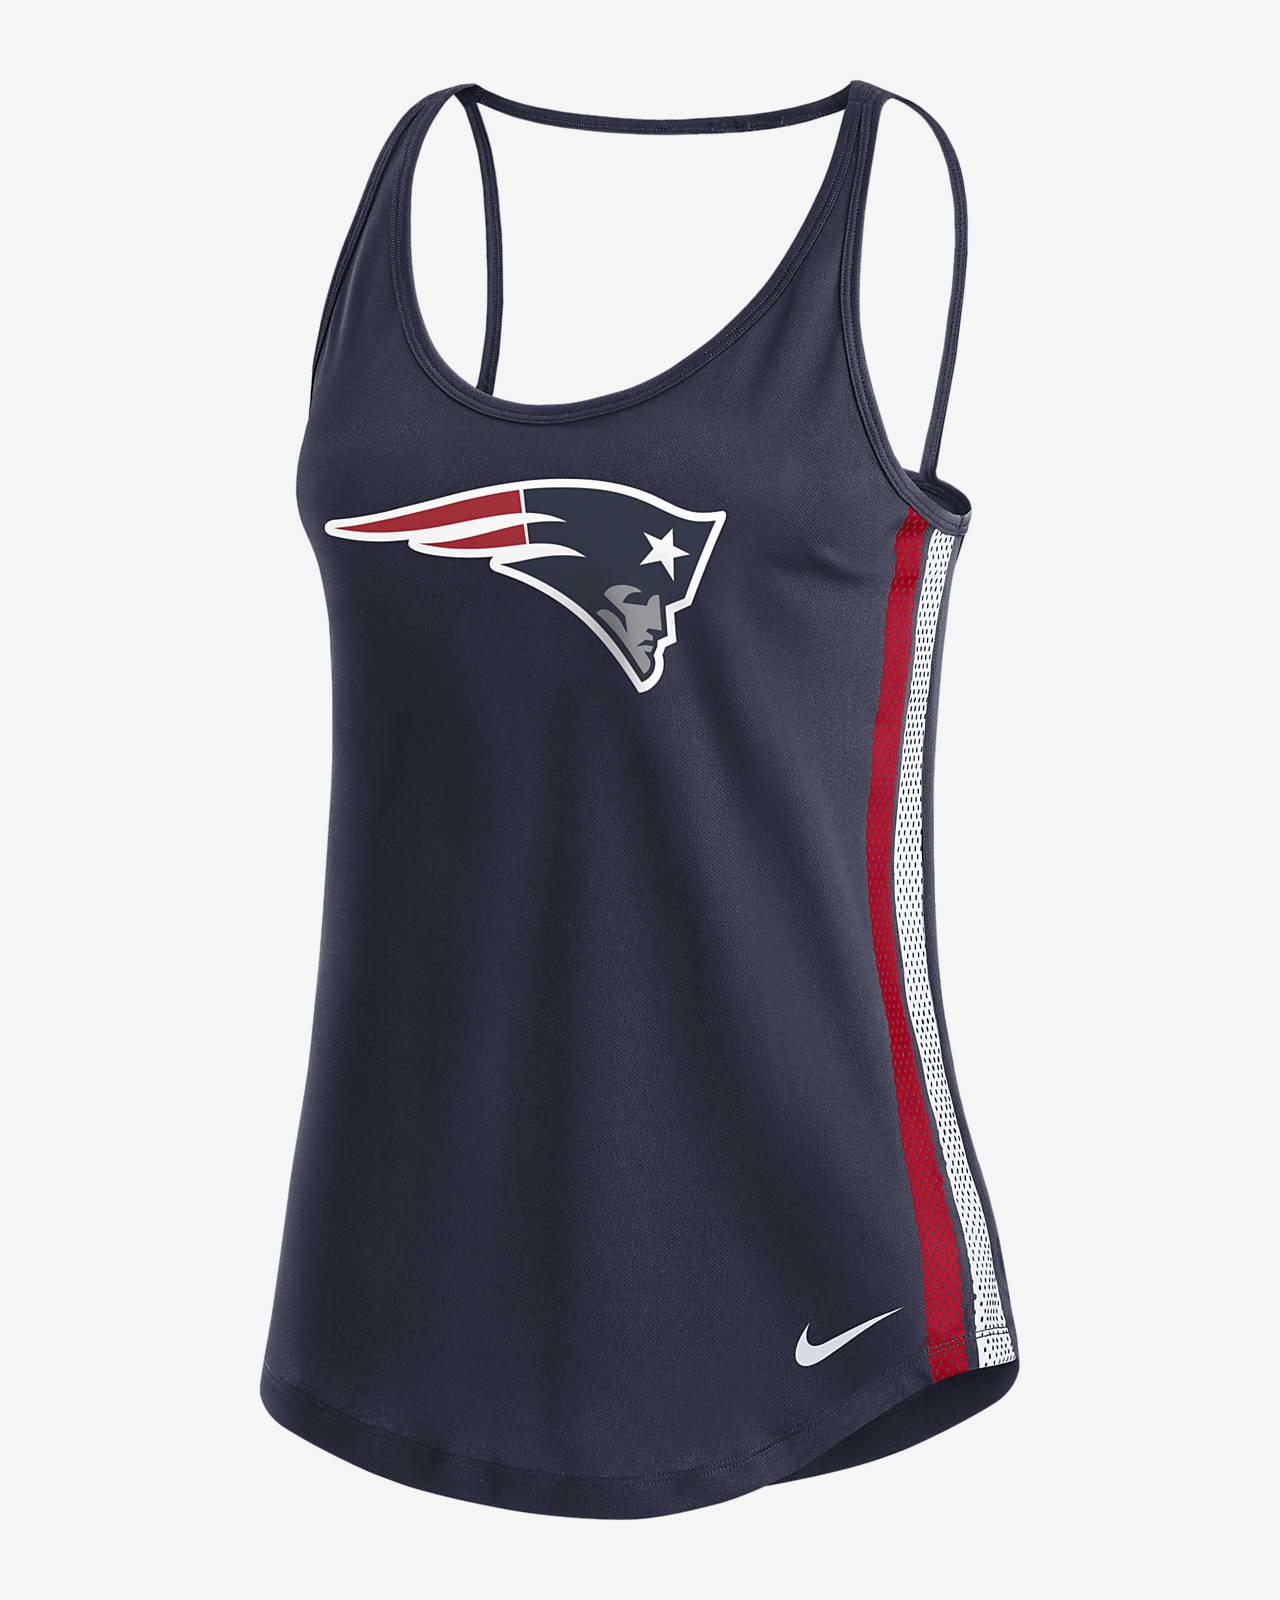 Nike Dri-FIT (NFL New England Patriots) Women's Open Back Tank Top